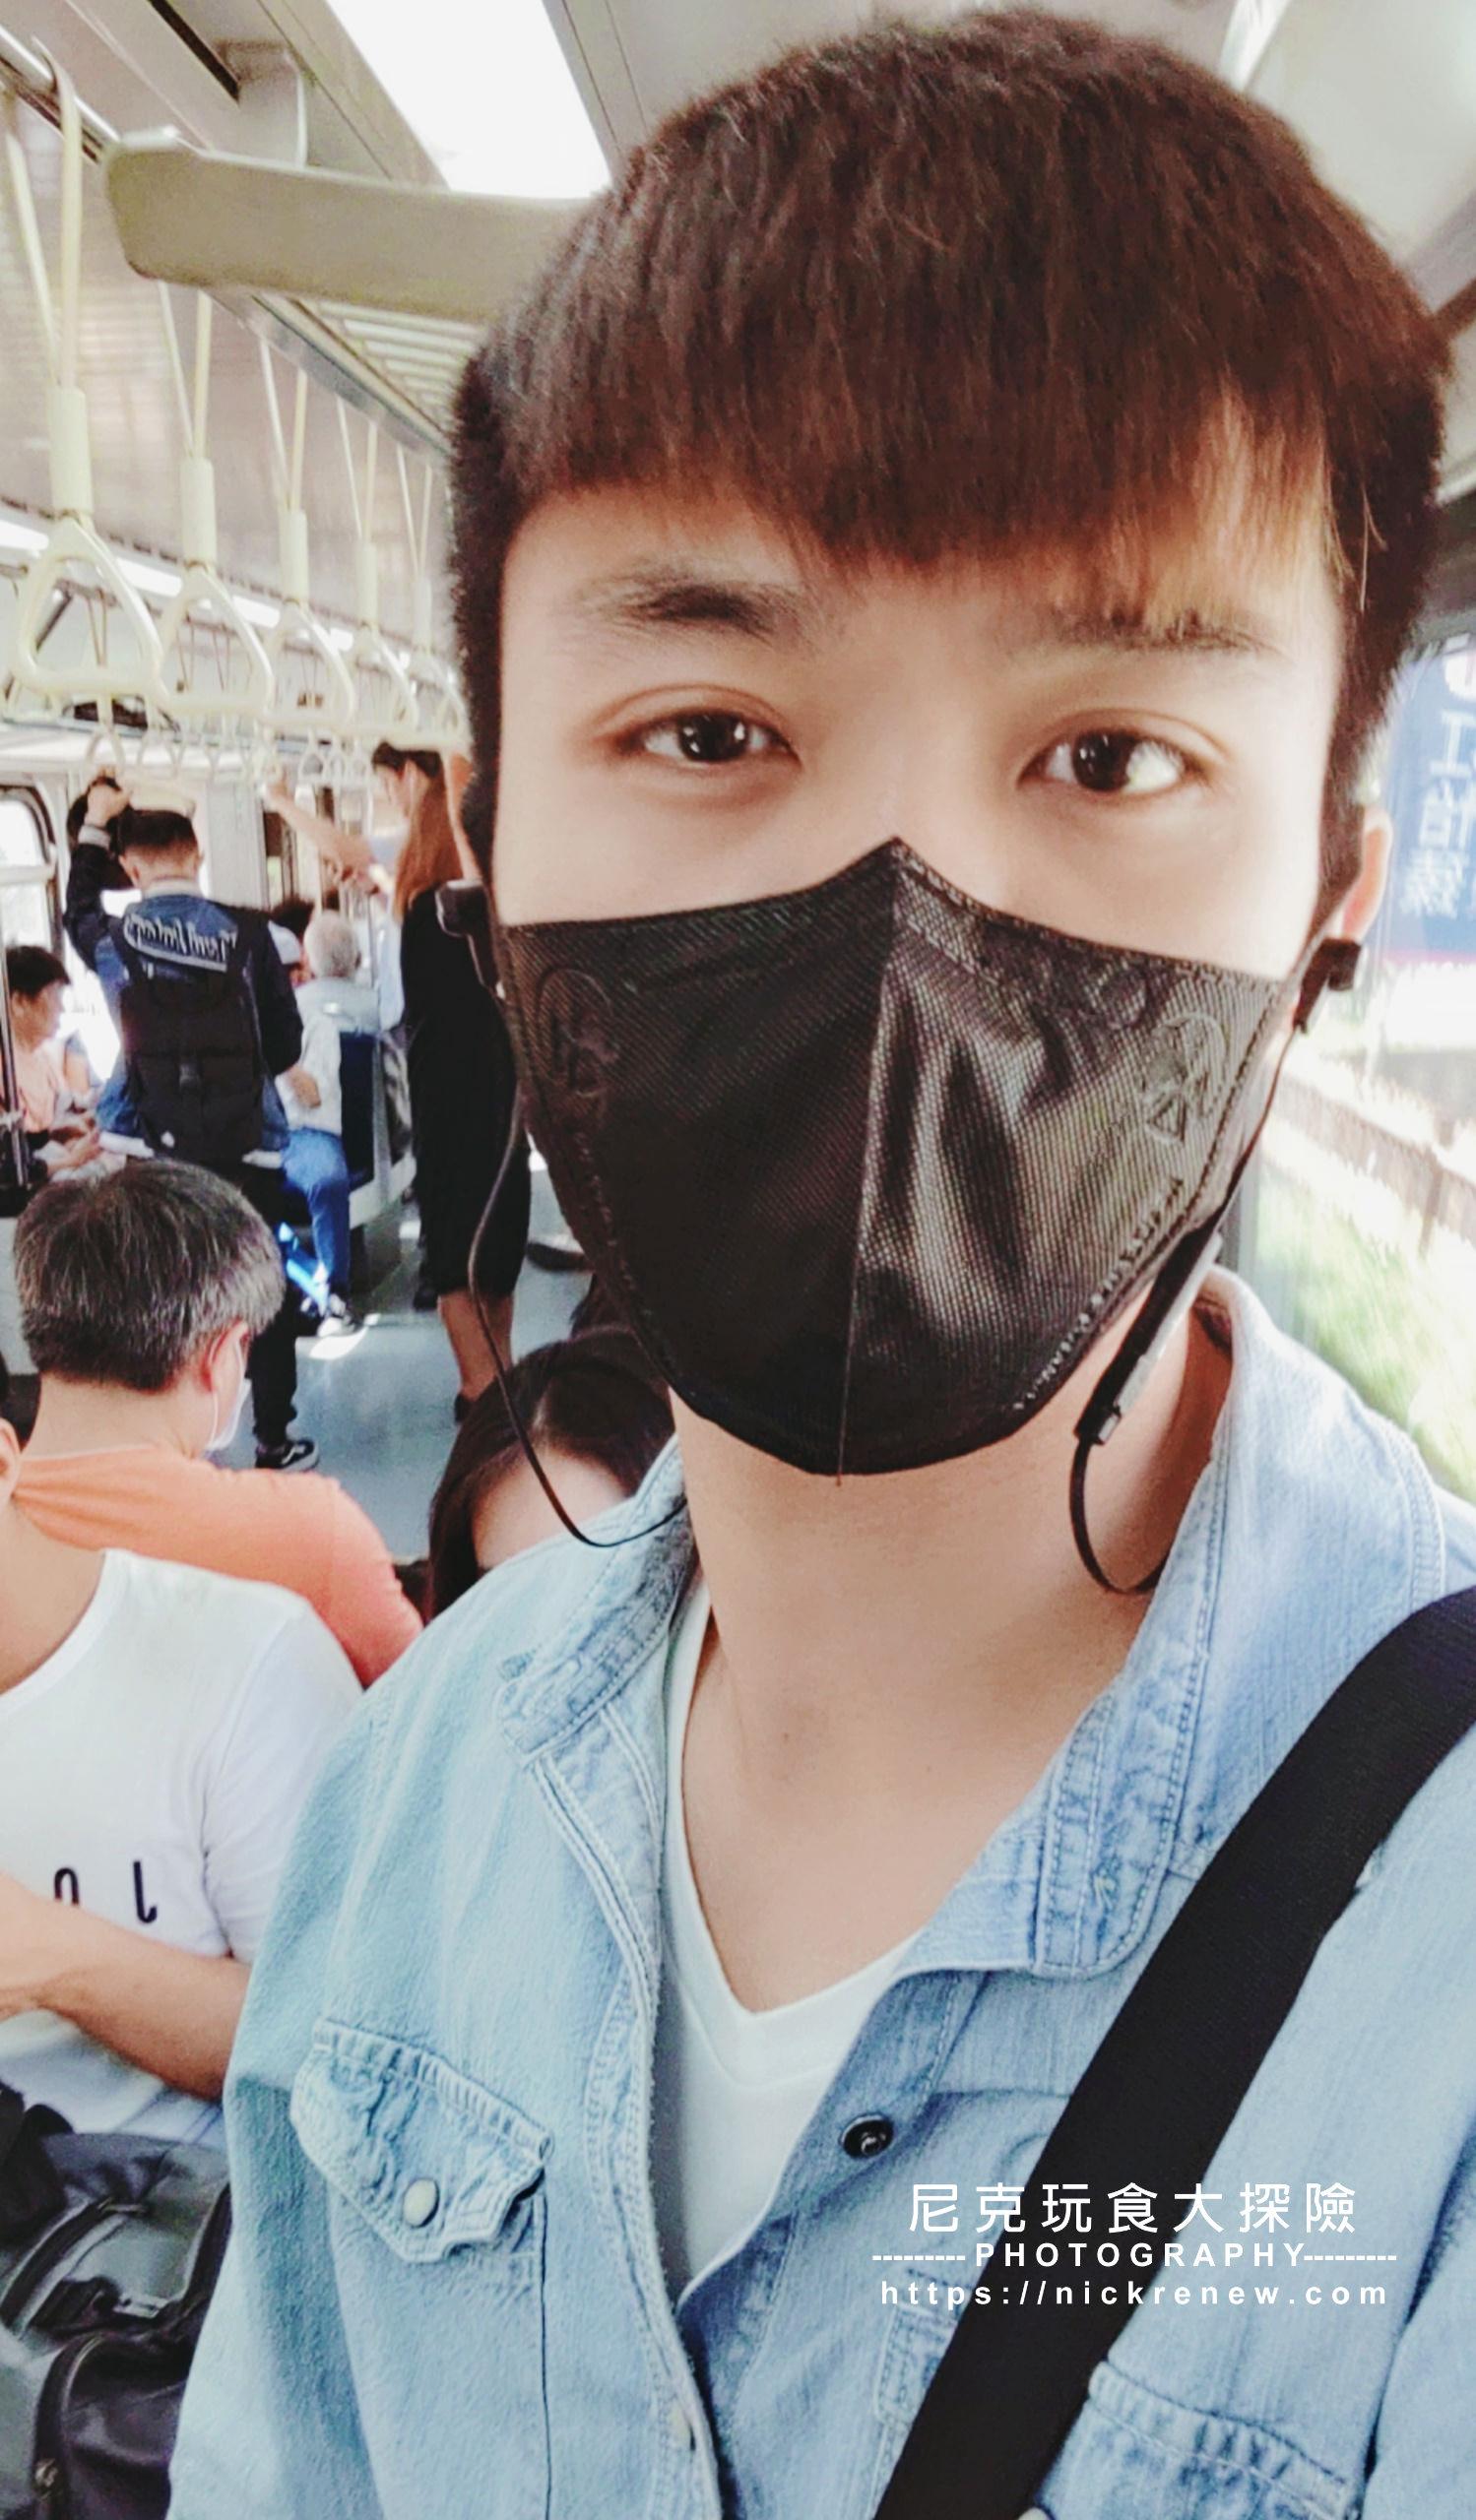 SelfieCity_20181106112529_save